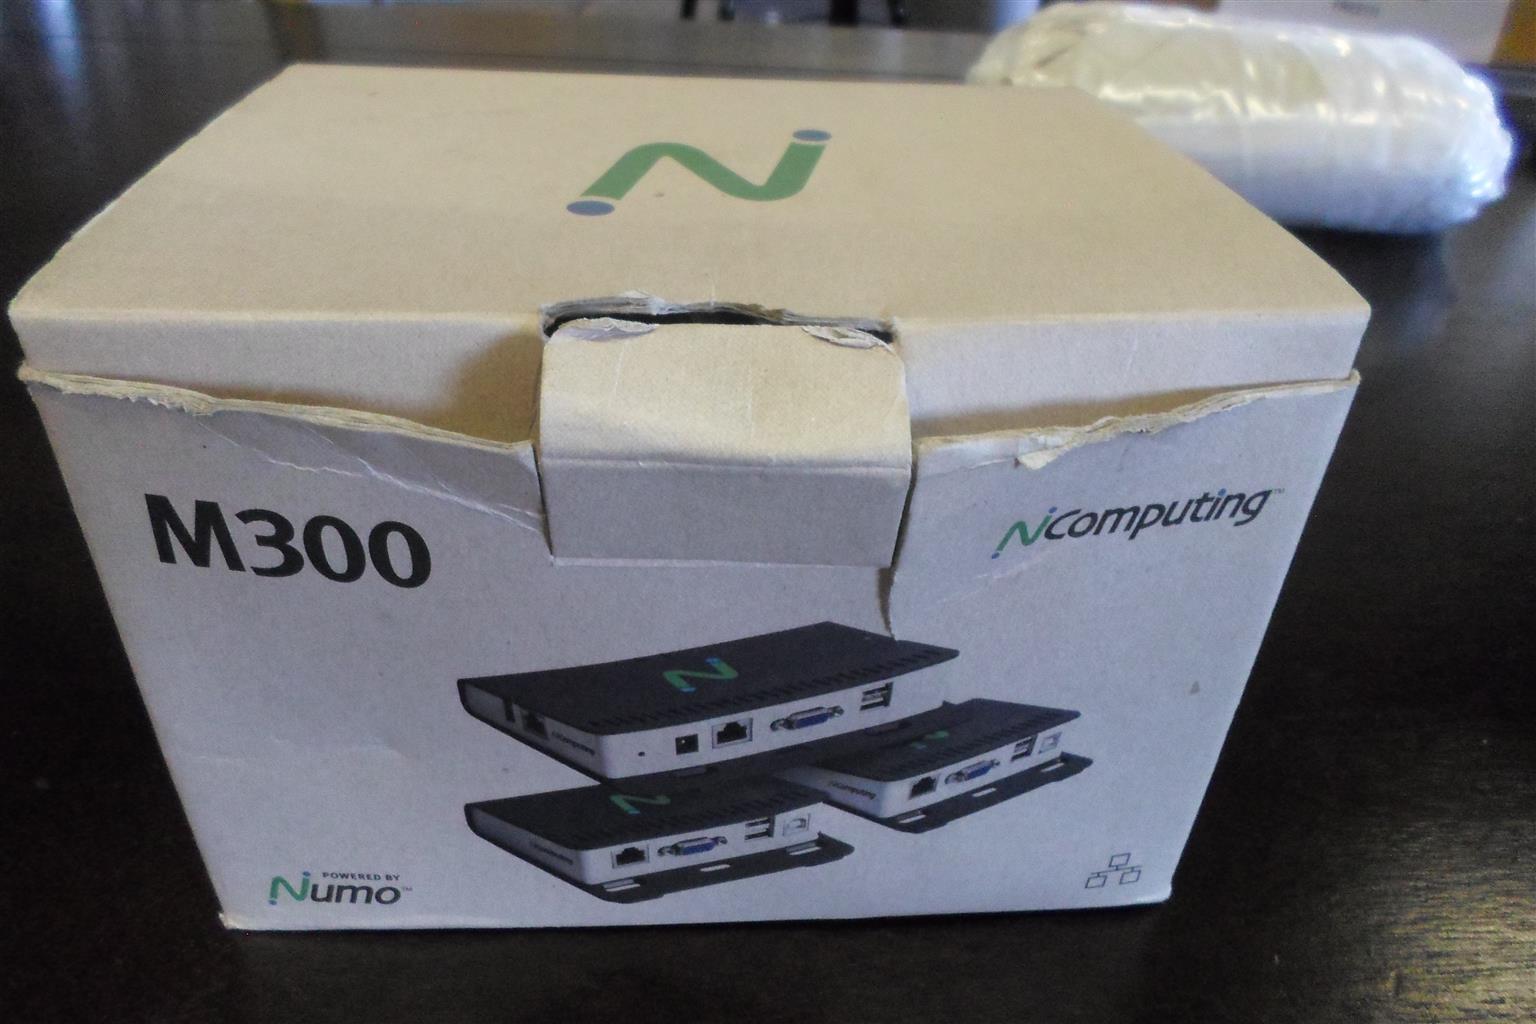 Ncomputing M300 Computer Accessories